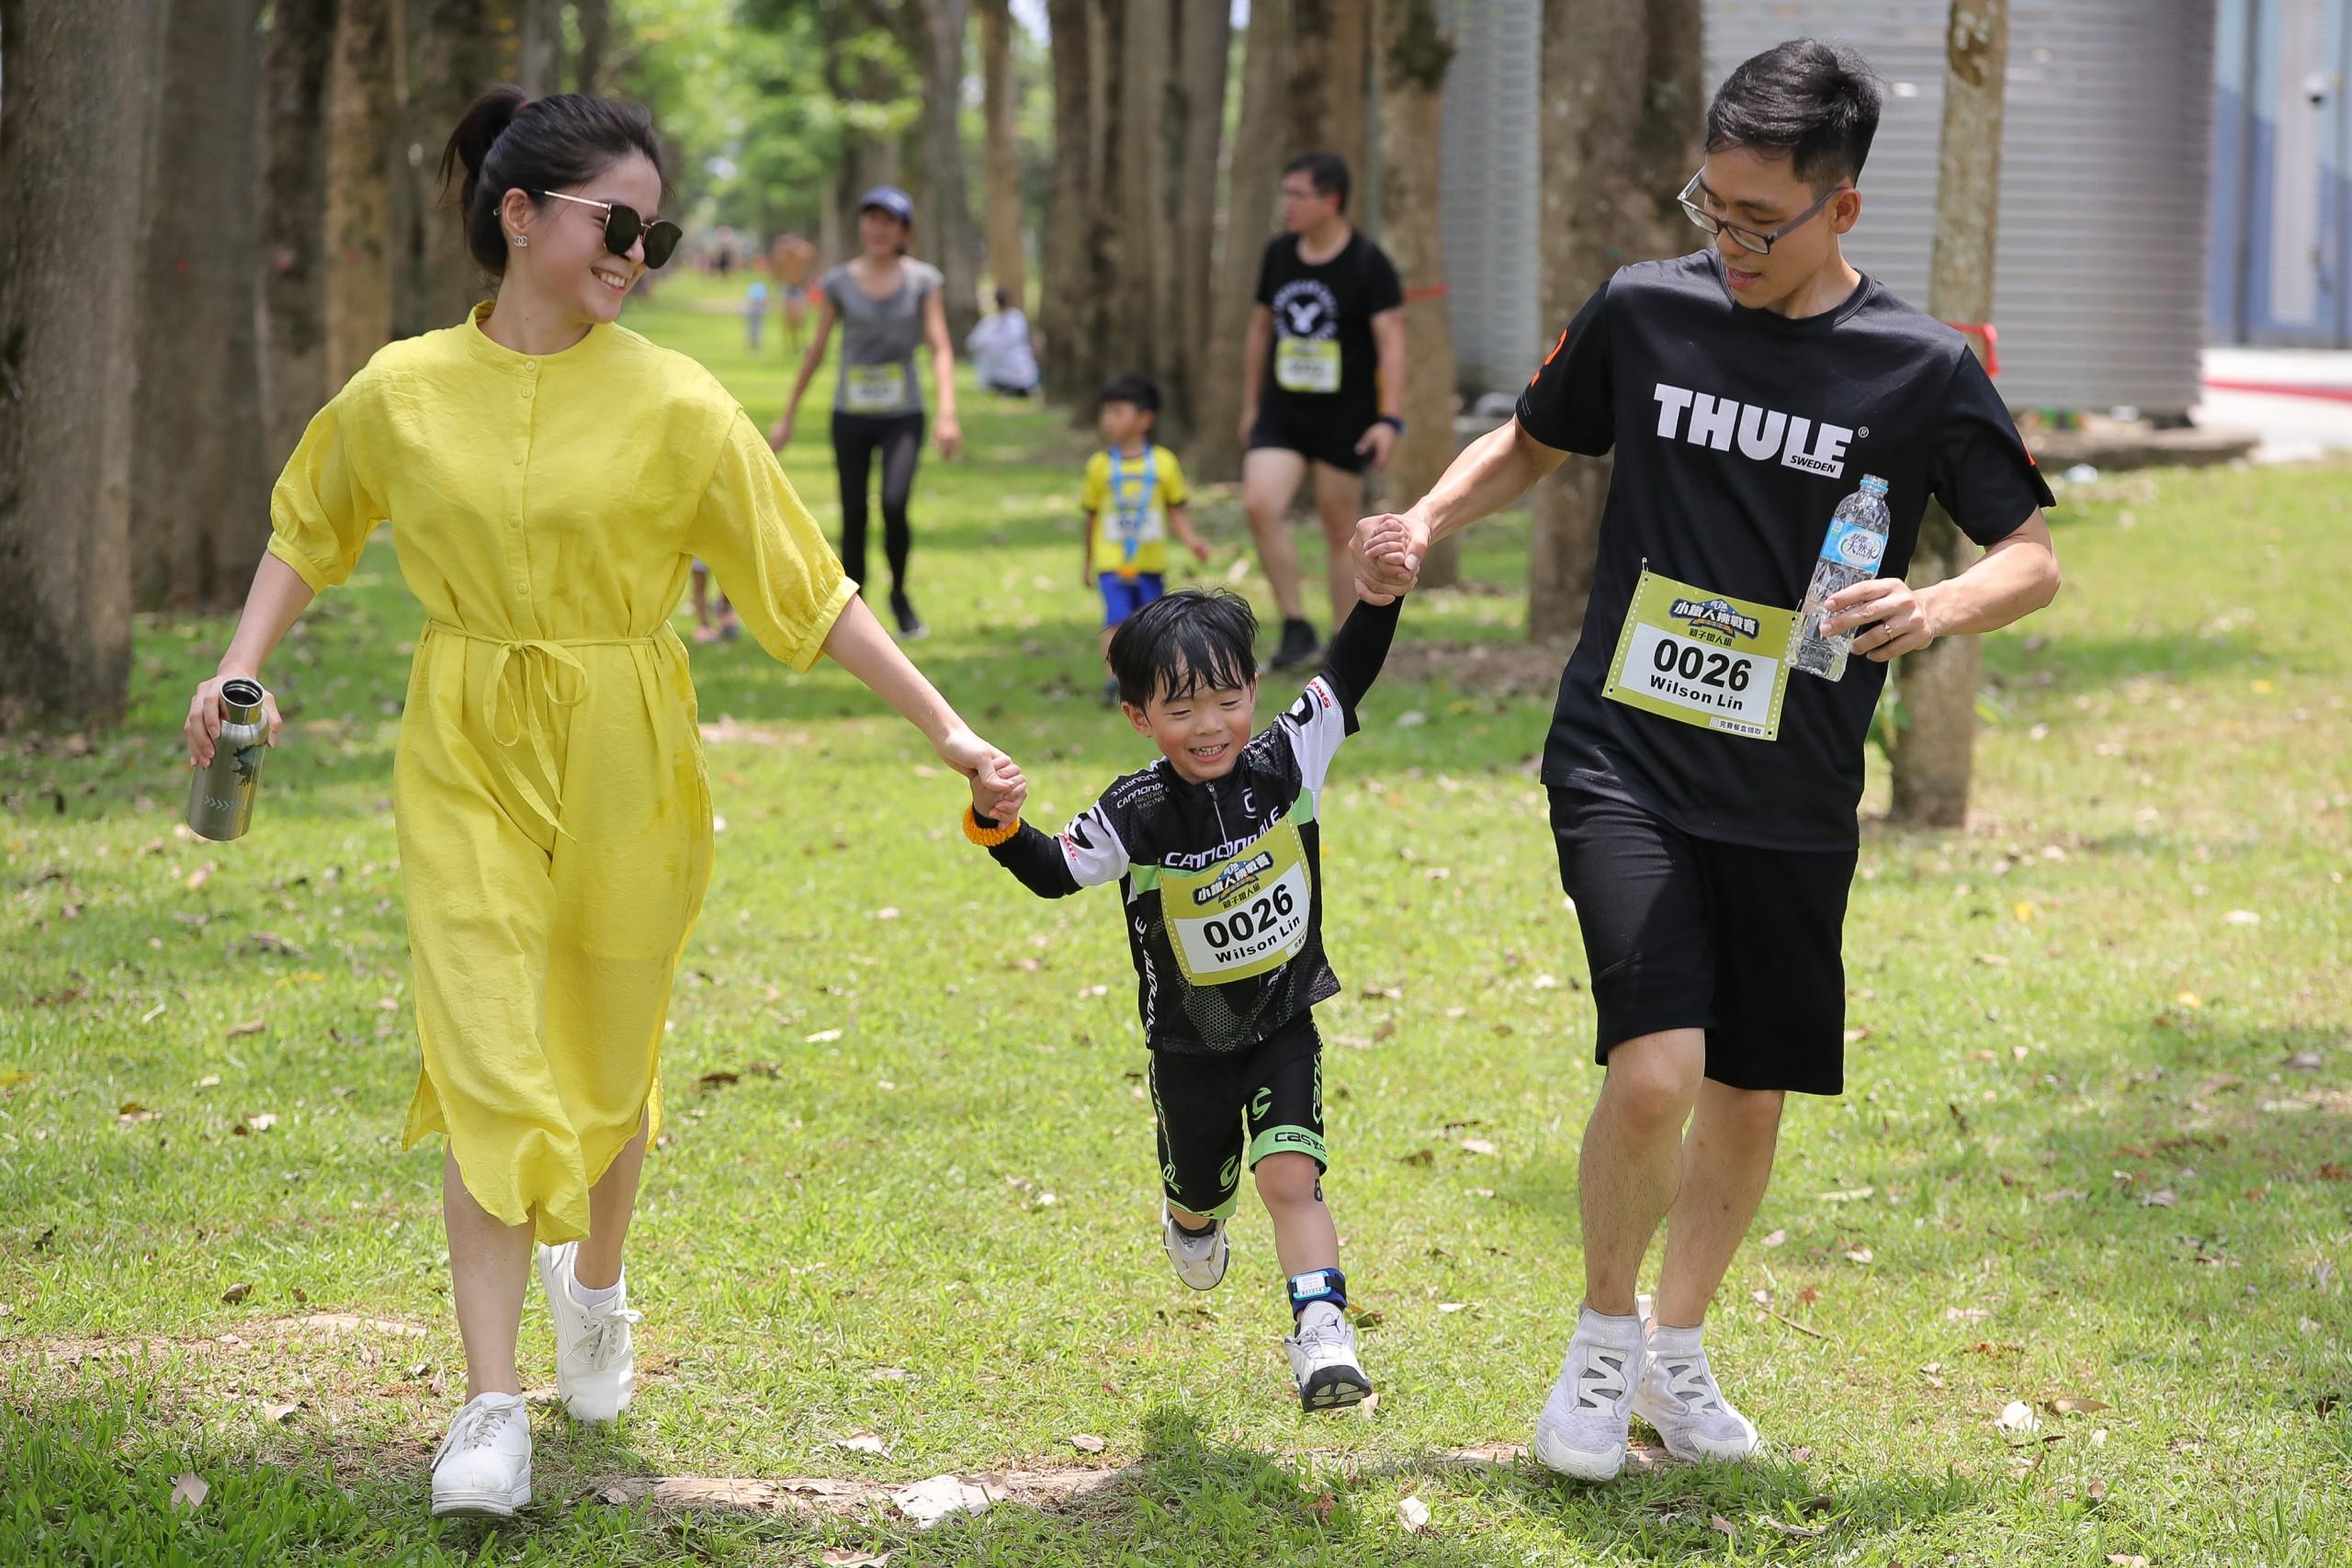 德築-DEZU-project-Fun3sport-children-triathlon-challenge-26